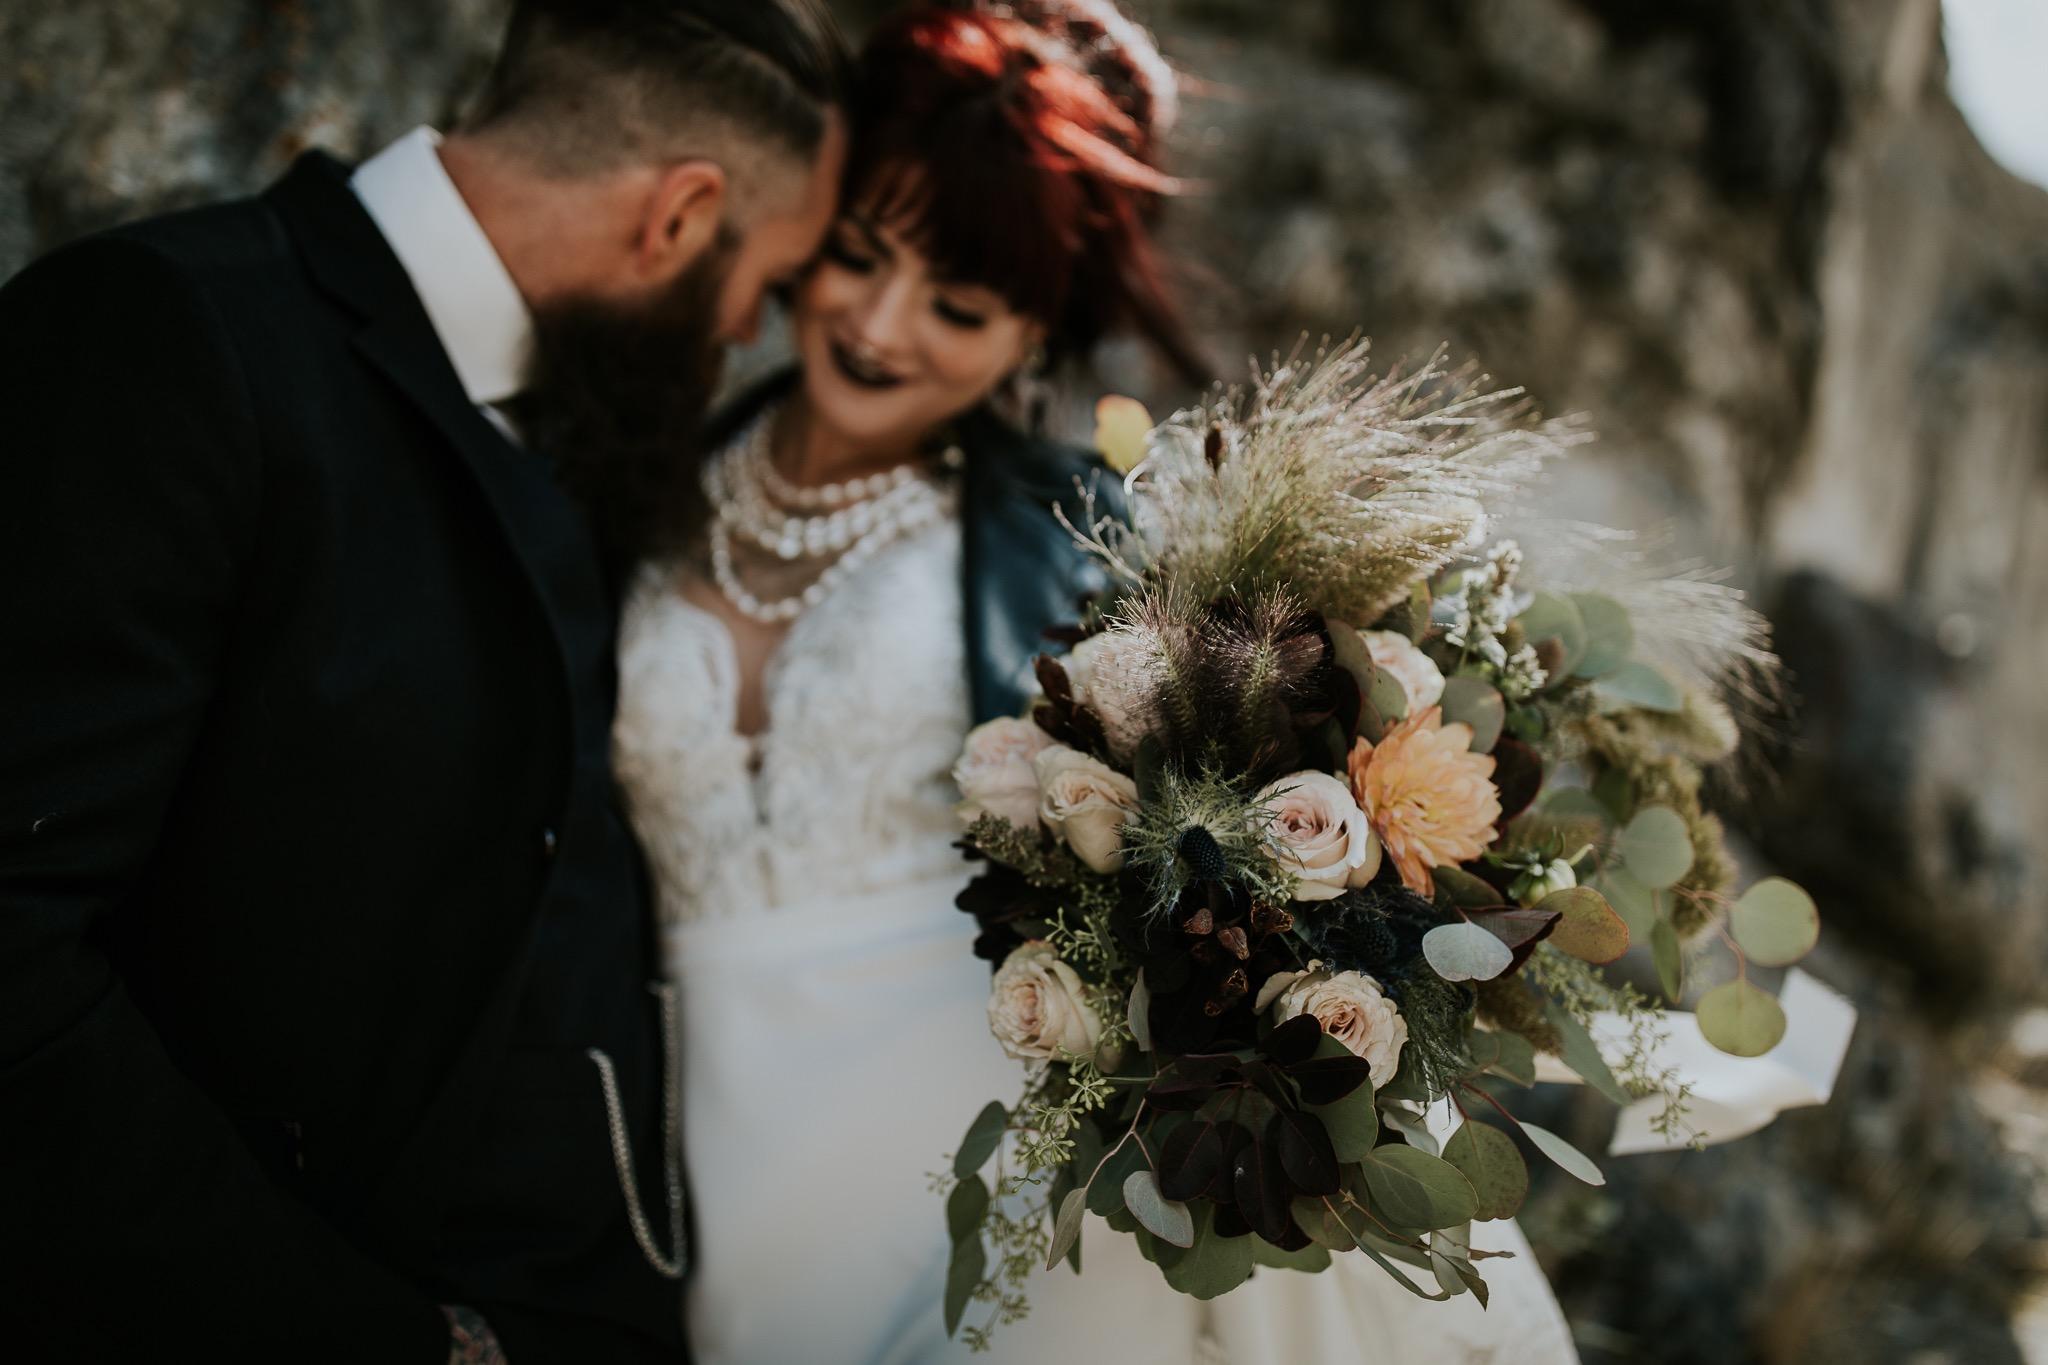 20170915-canmore-moody-wedding-photographer-creekside-creeksidestyledshoot-time&fate-5305